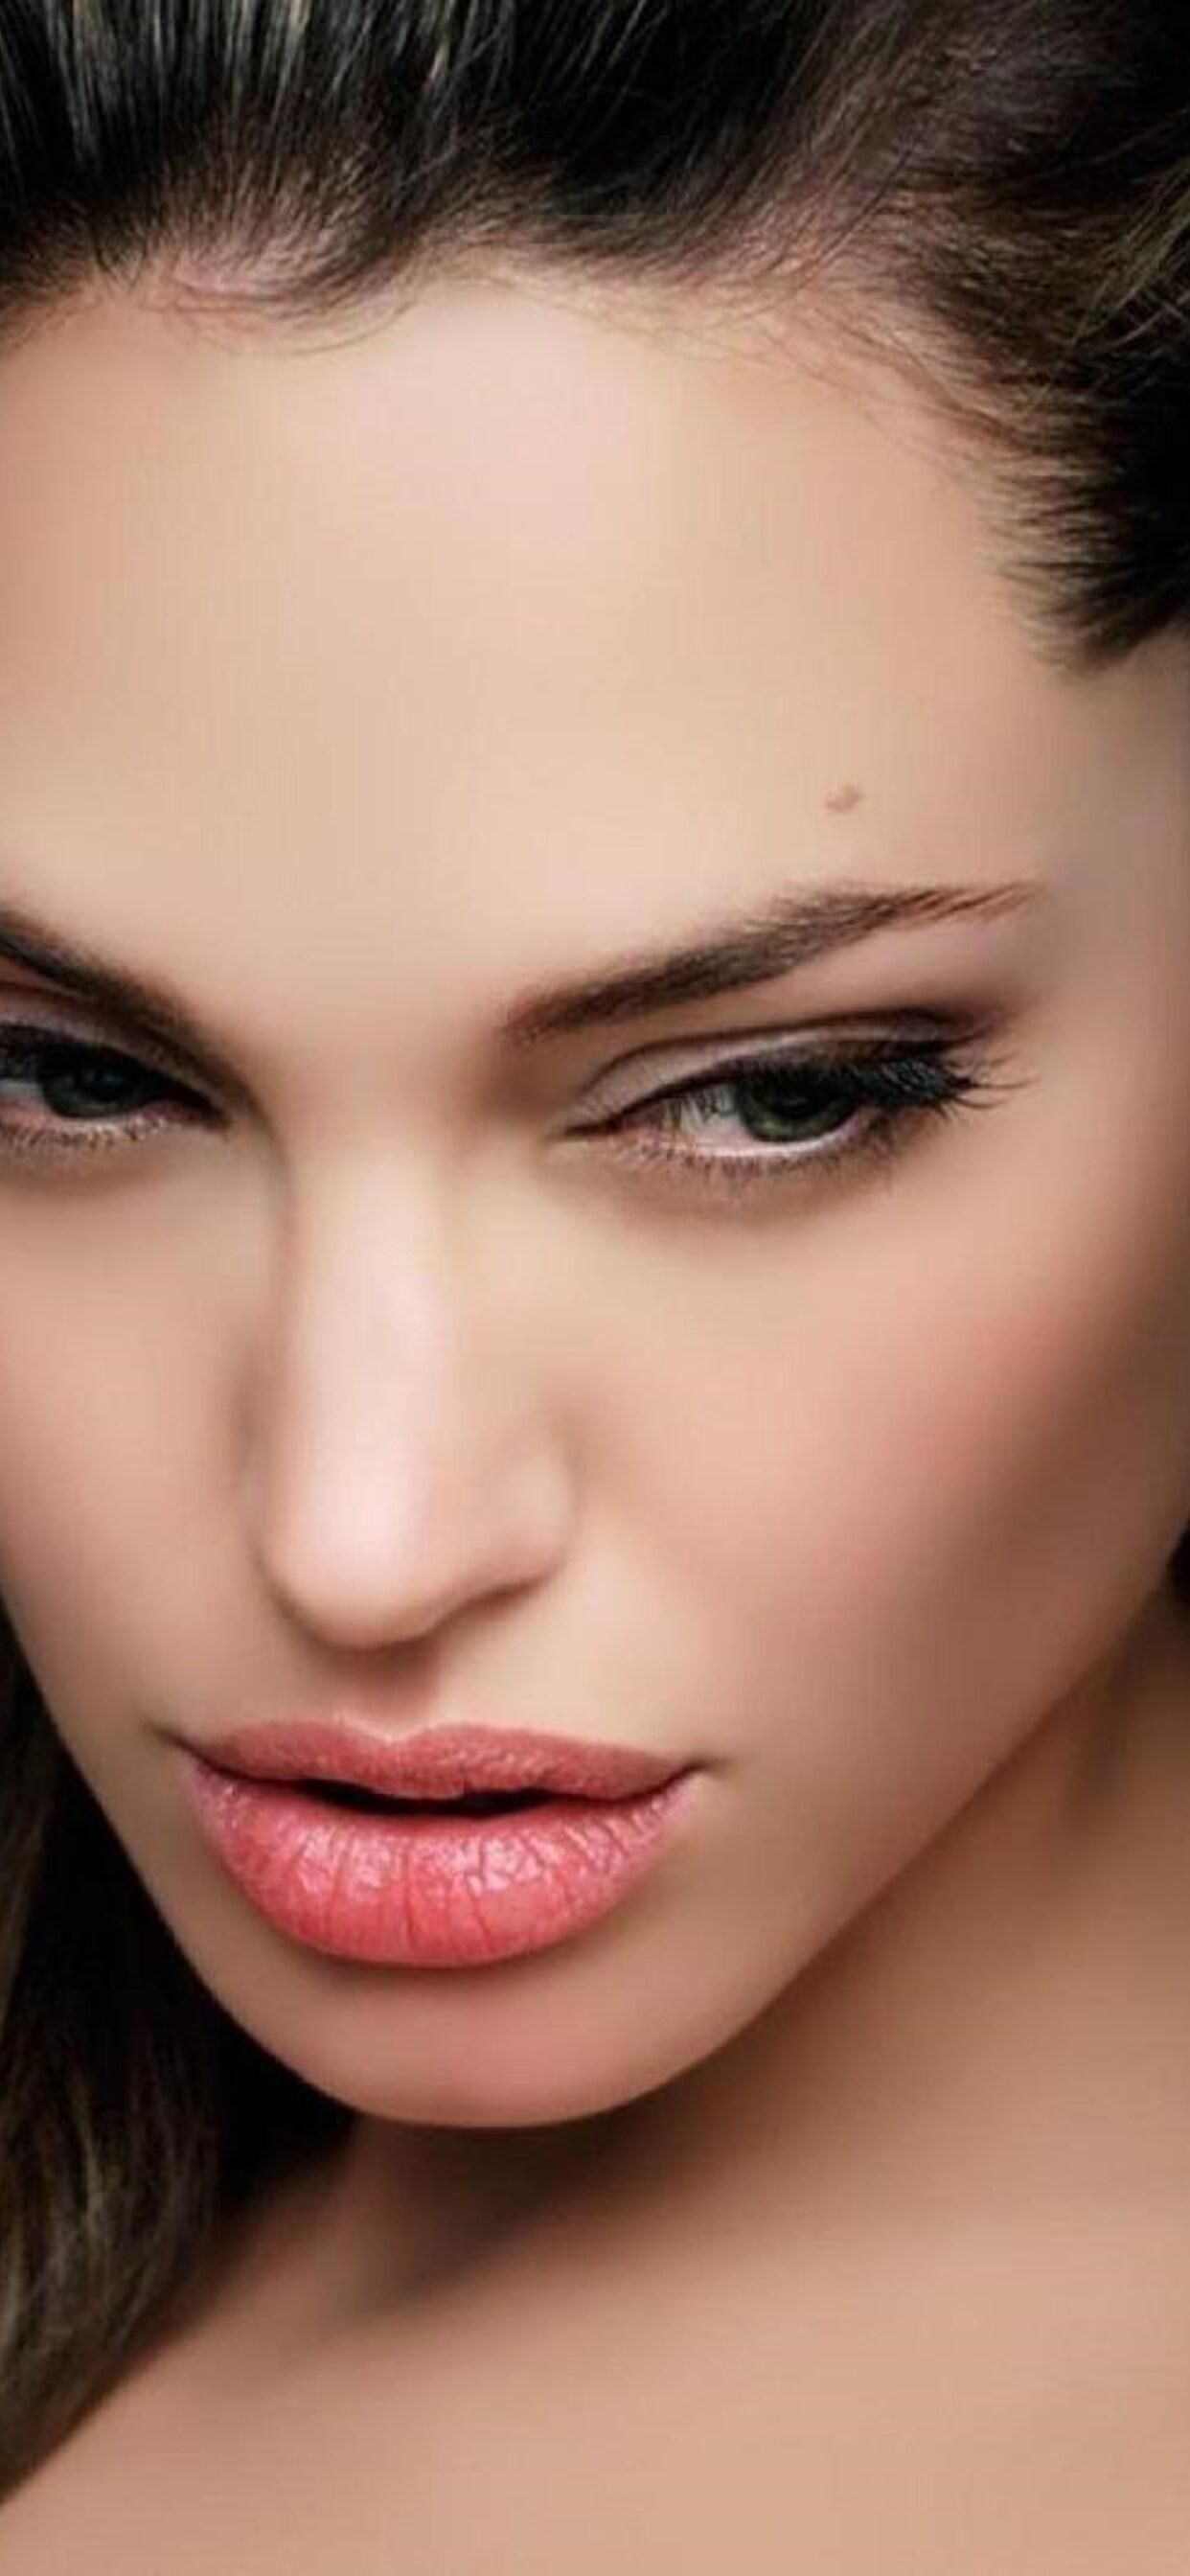 angelina-jolie-face-wide.jpg